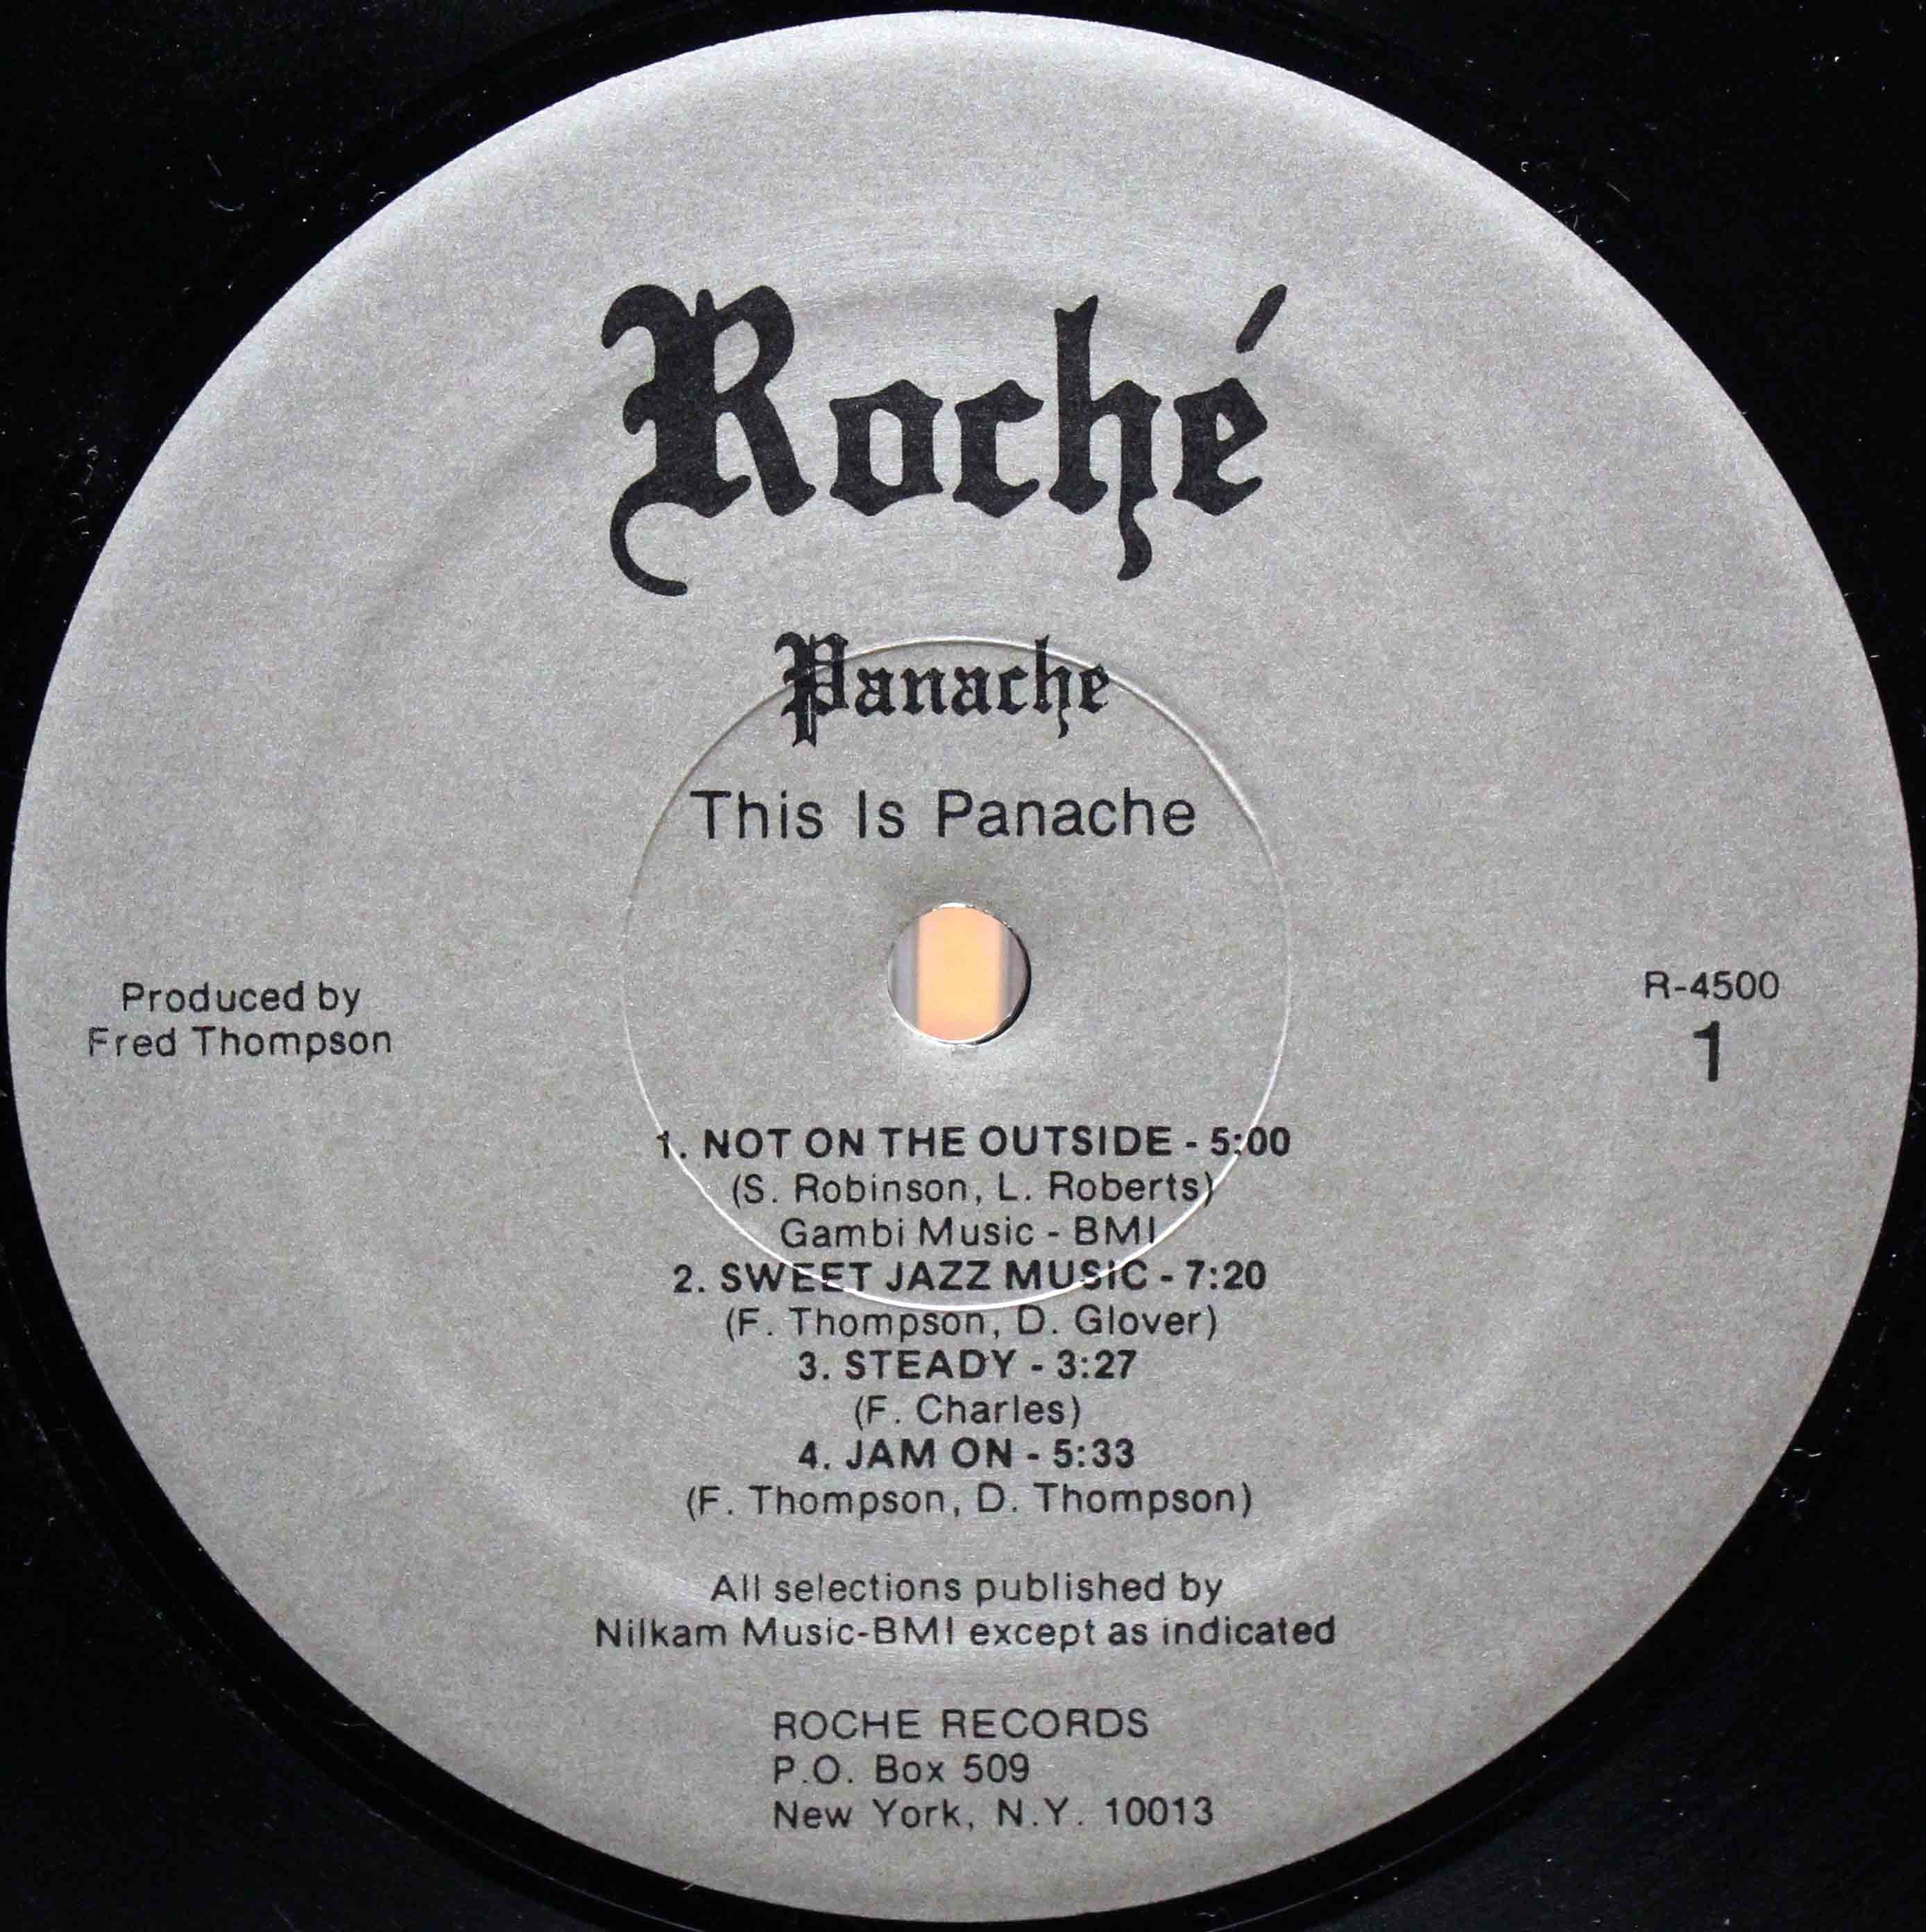 Panaché – This Is Panache 03